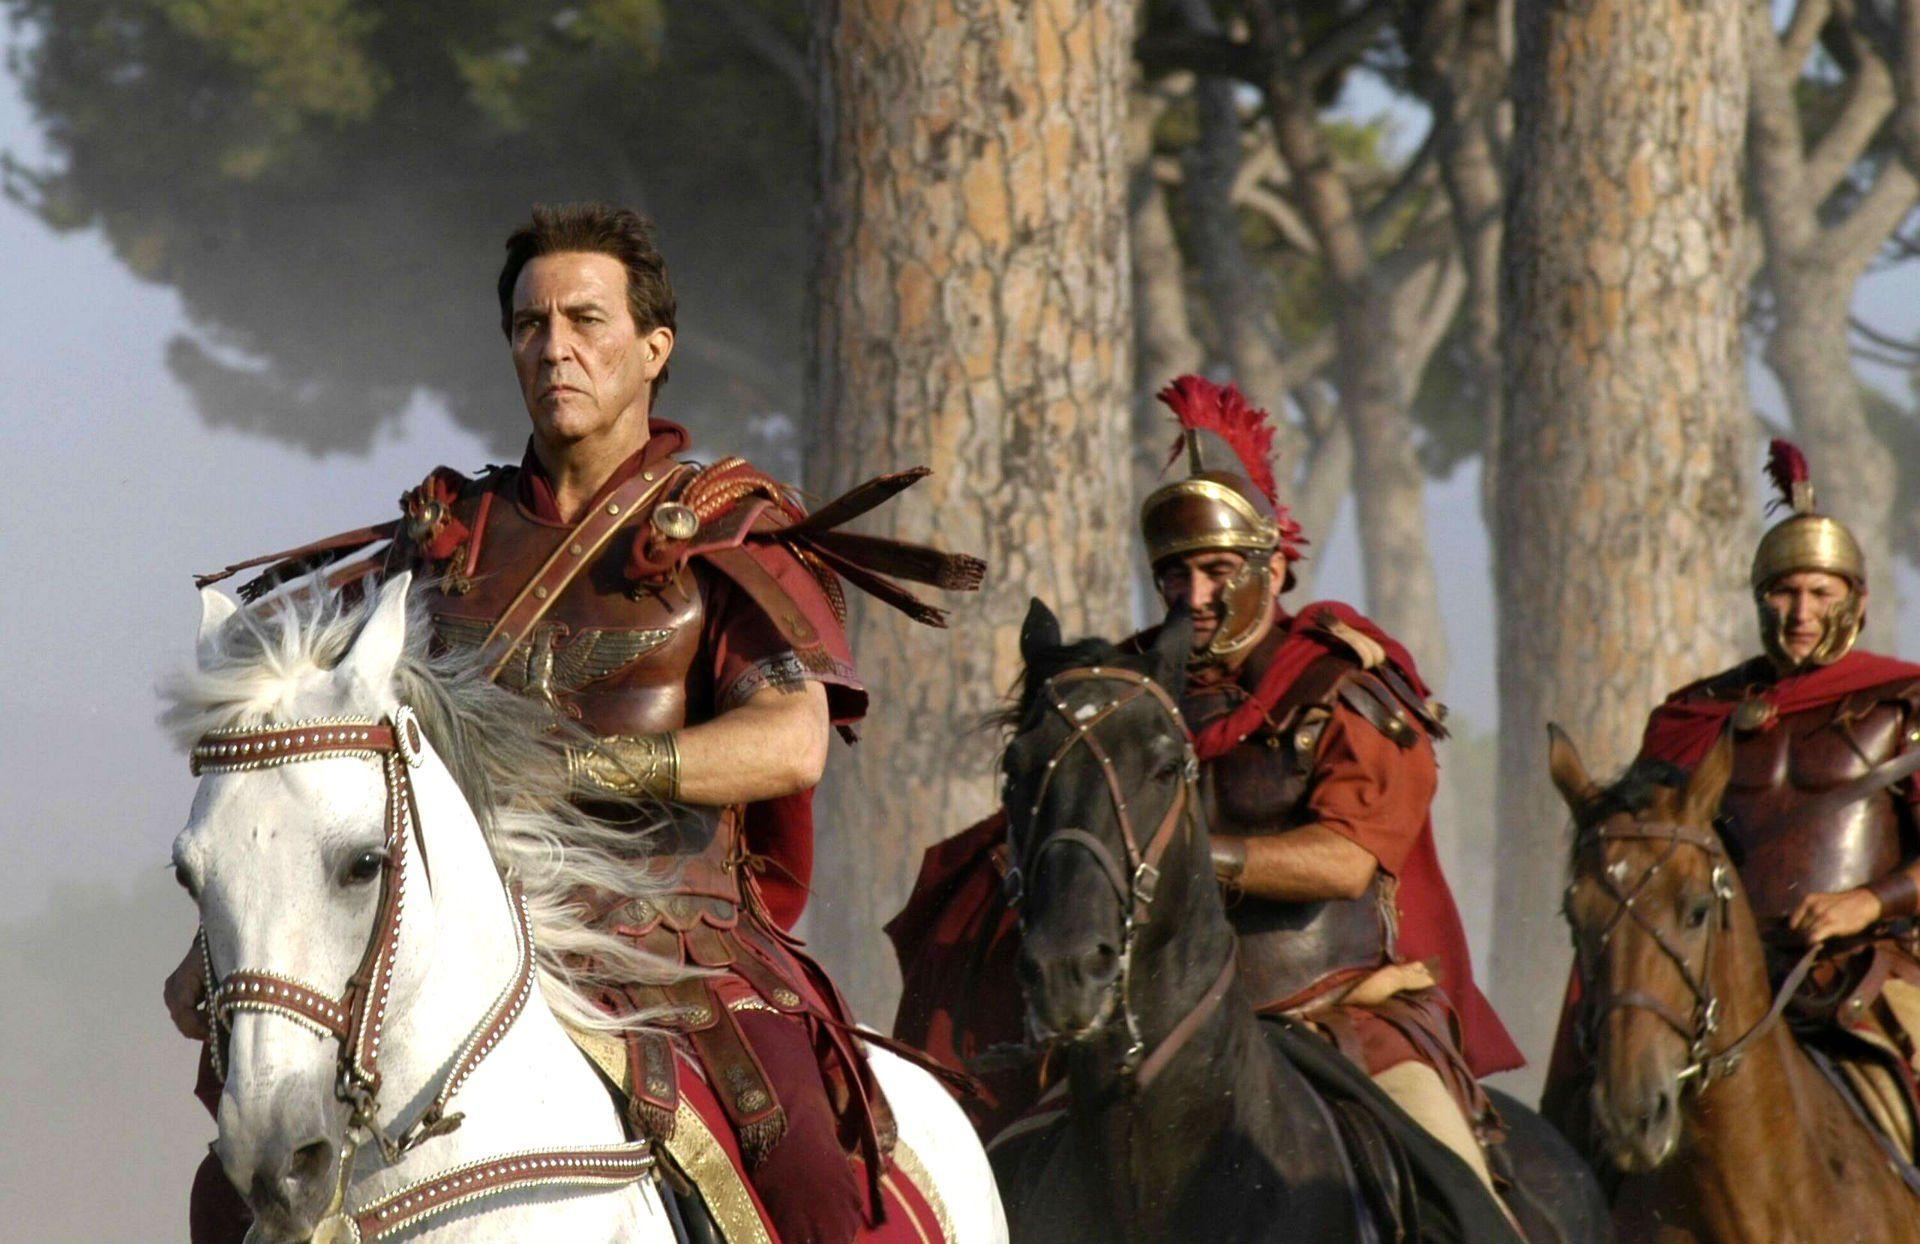 ROME action drama history hbo roman television series (59) wallpaper   1920x1244   337626   WallpaperUP